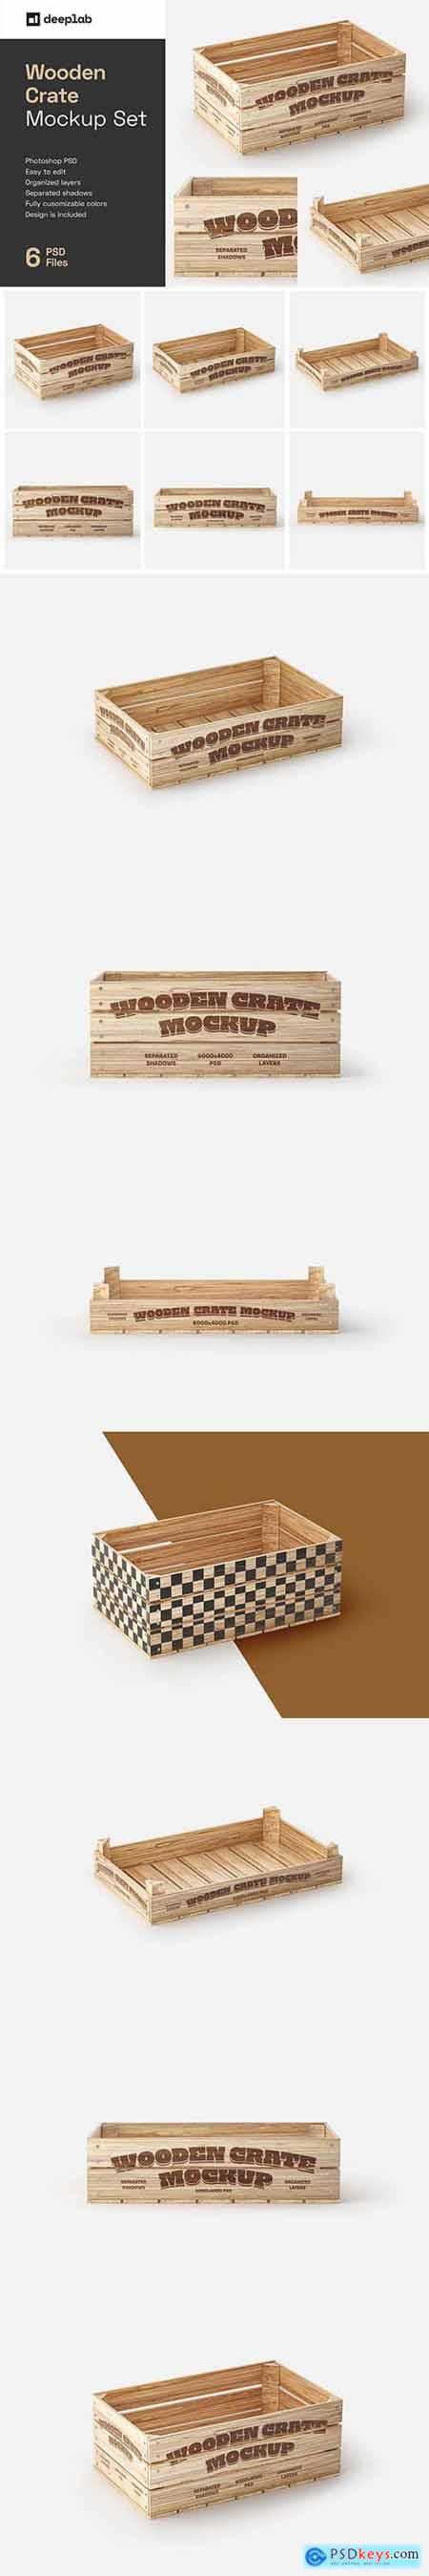 Creativemarket Wooden Crate Mockup Set 6042095